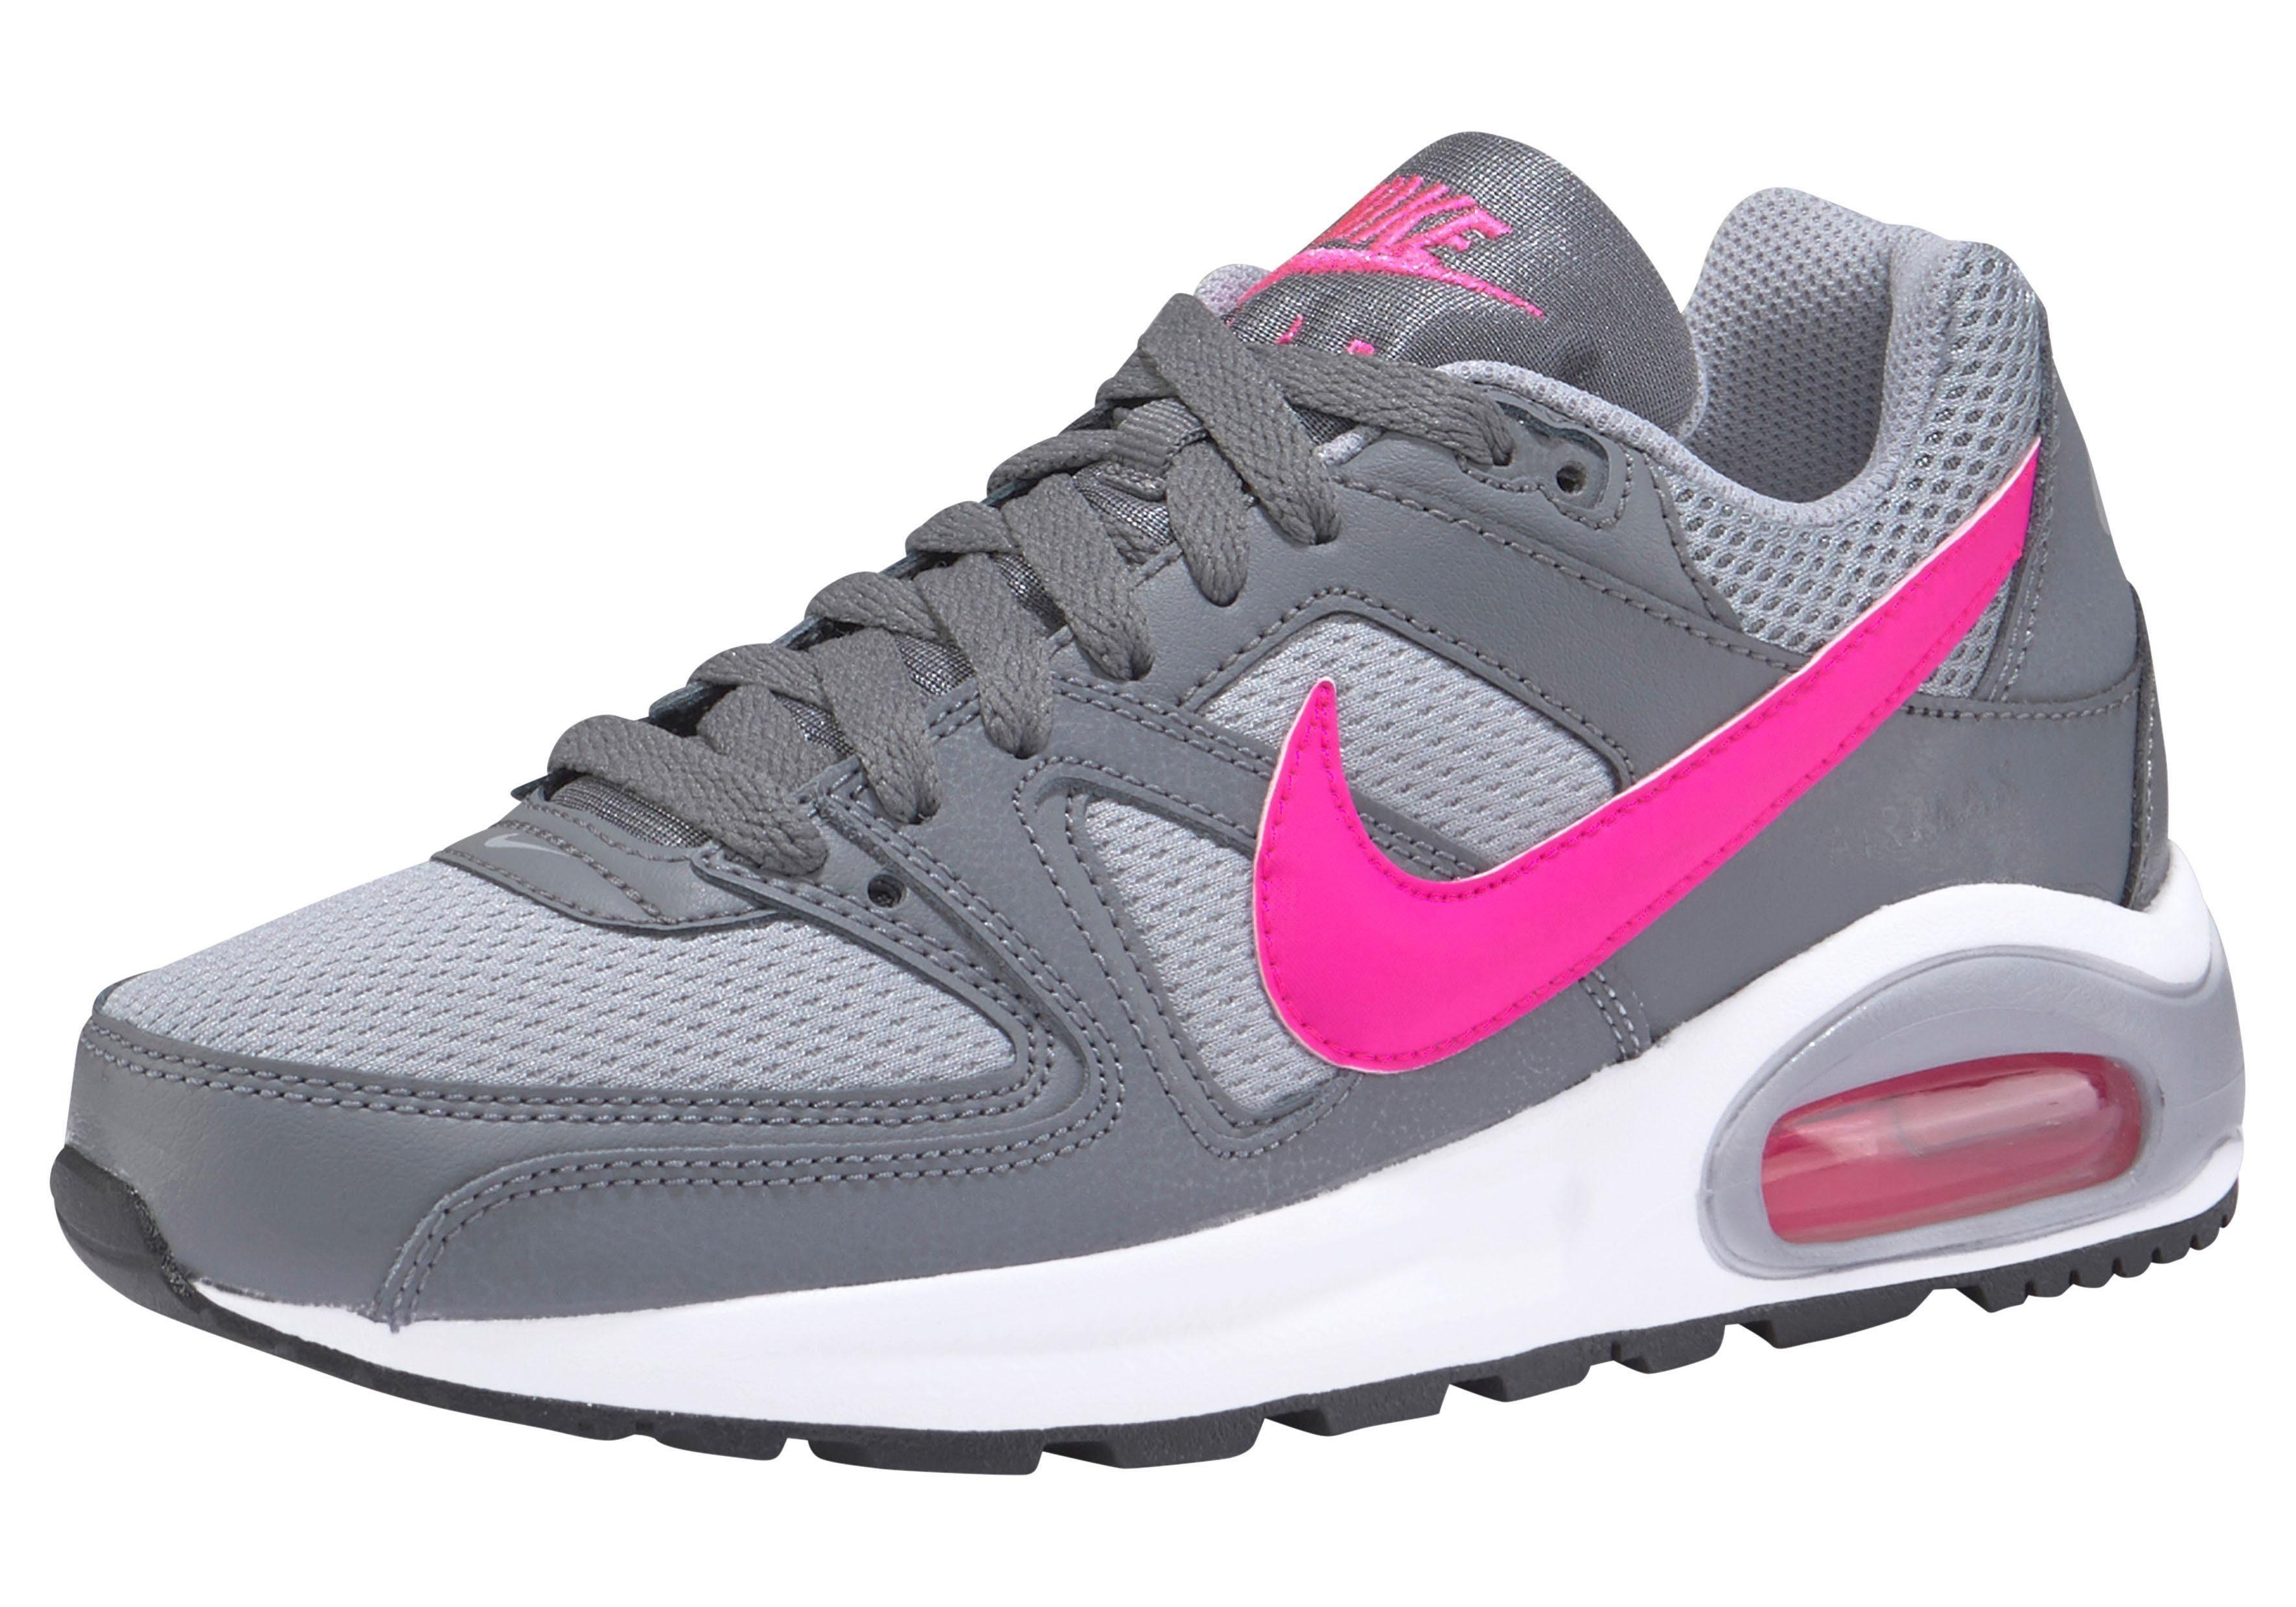 Nike Sportswear Air Max Command G Sneaker kaufen  grau-neonpink